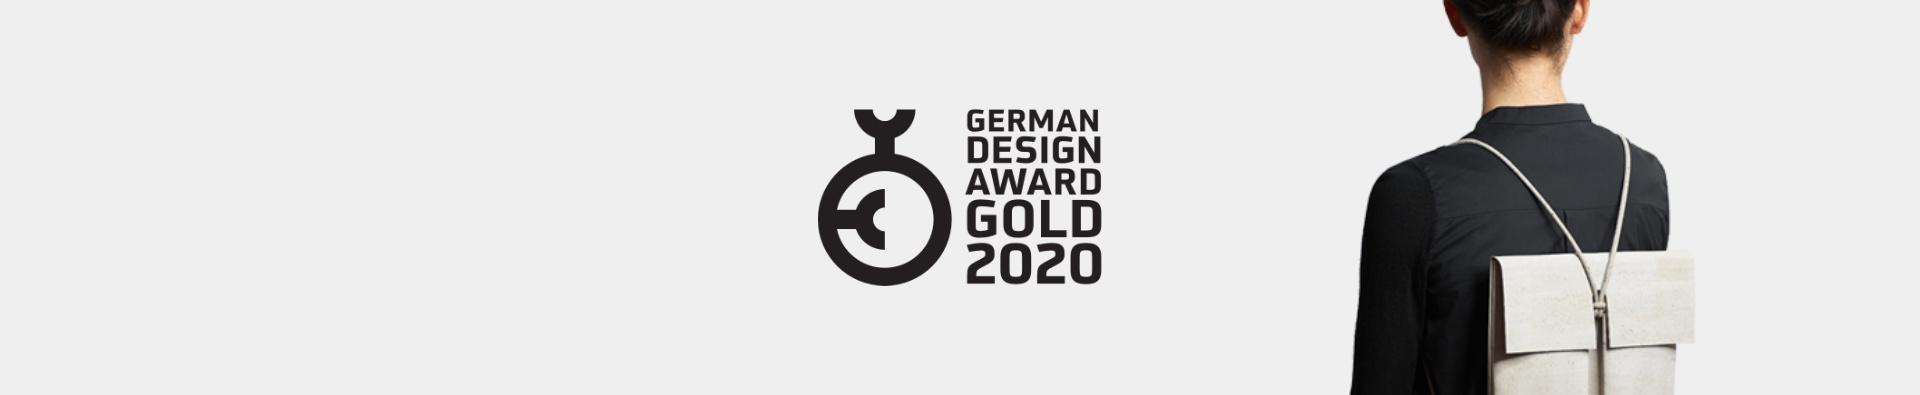 burggrafburggraf-Rucksack-Como-German-Design-Award-2020